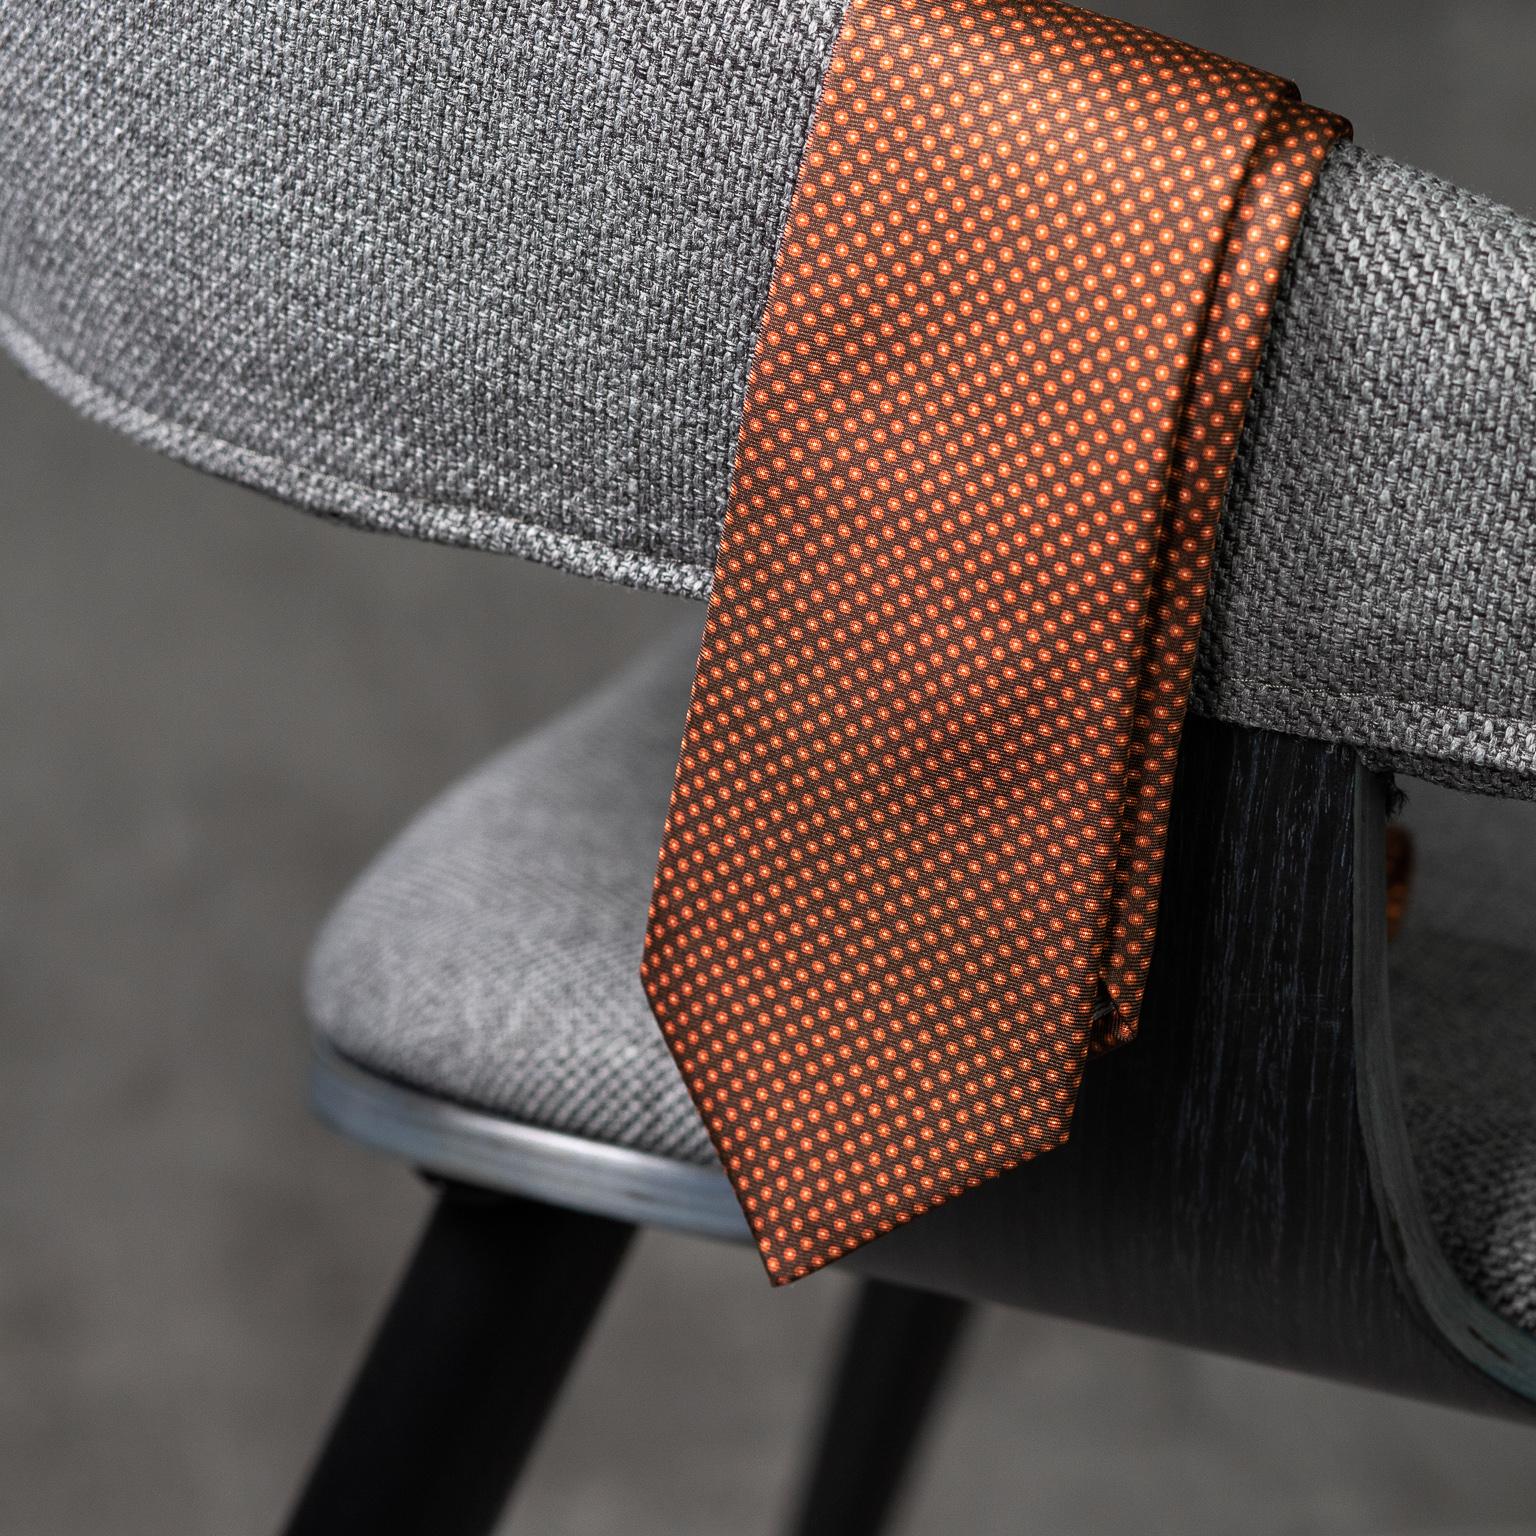 PRINTED SILK SEDA ESTAMPADA-0568-Tie-Initials-Corbata-Iniciales-The Seëlk-3